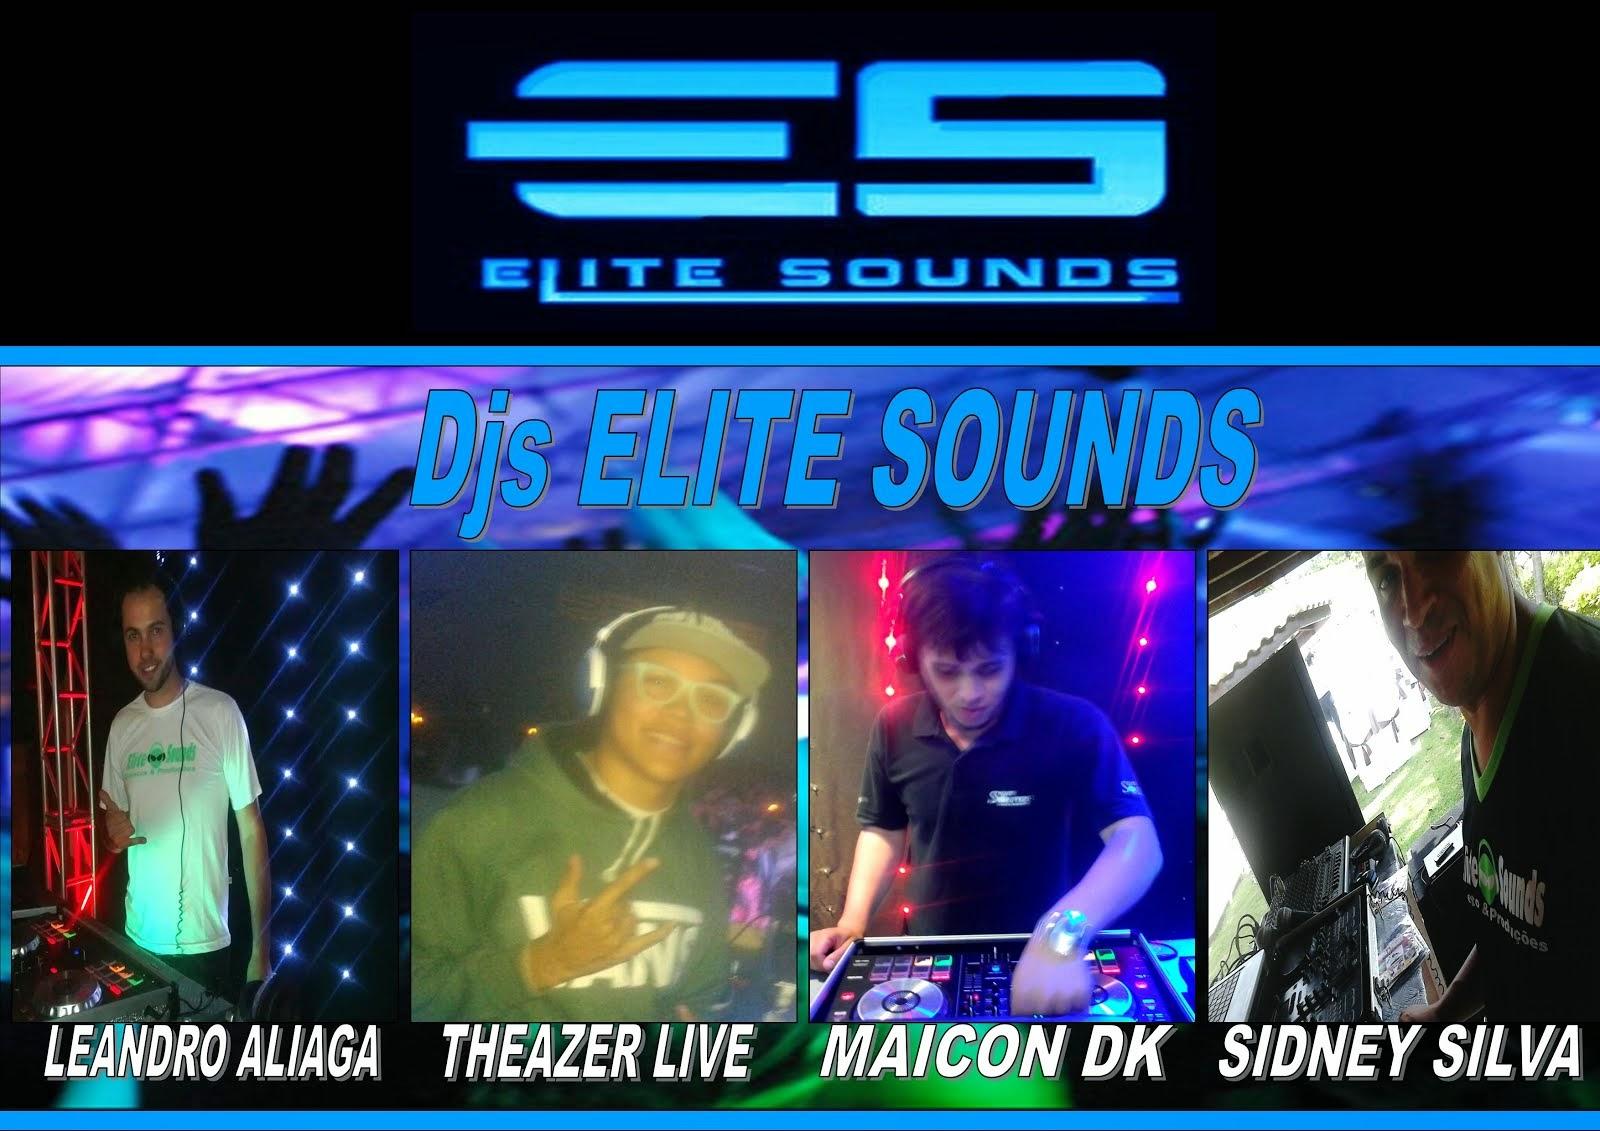 Djs Elite Sounds